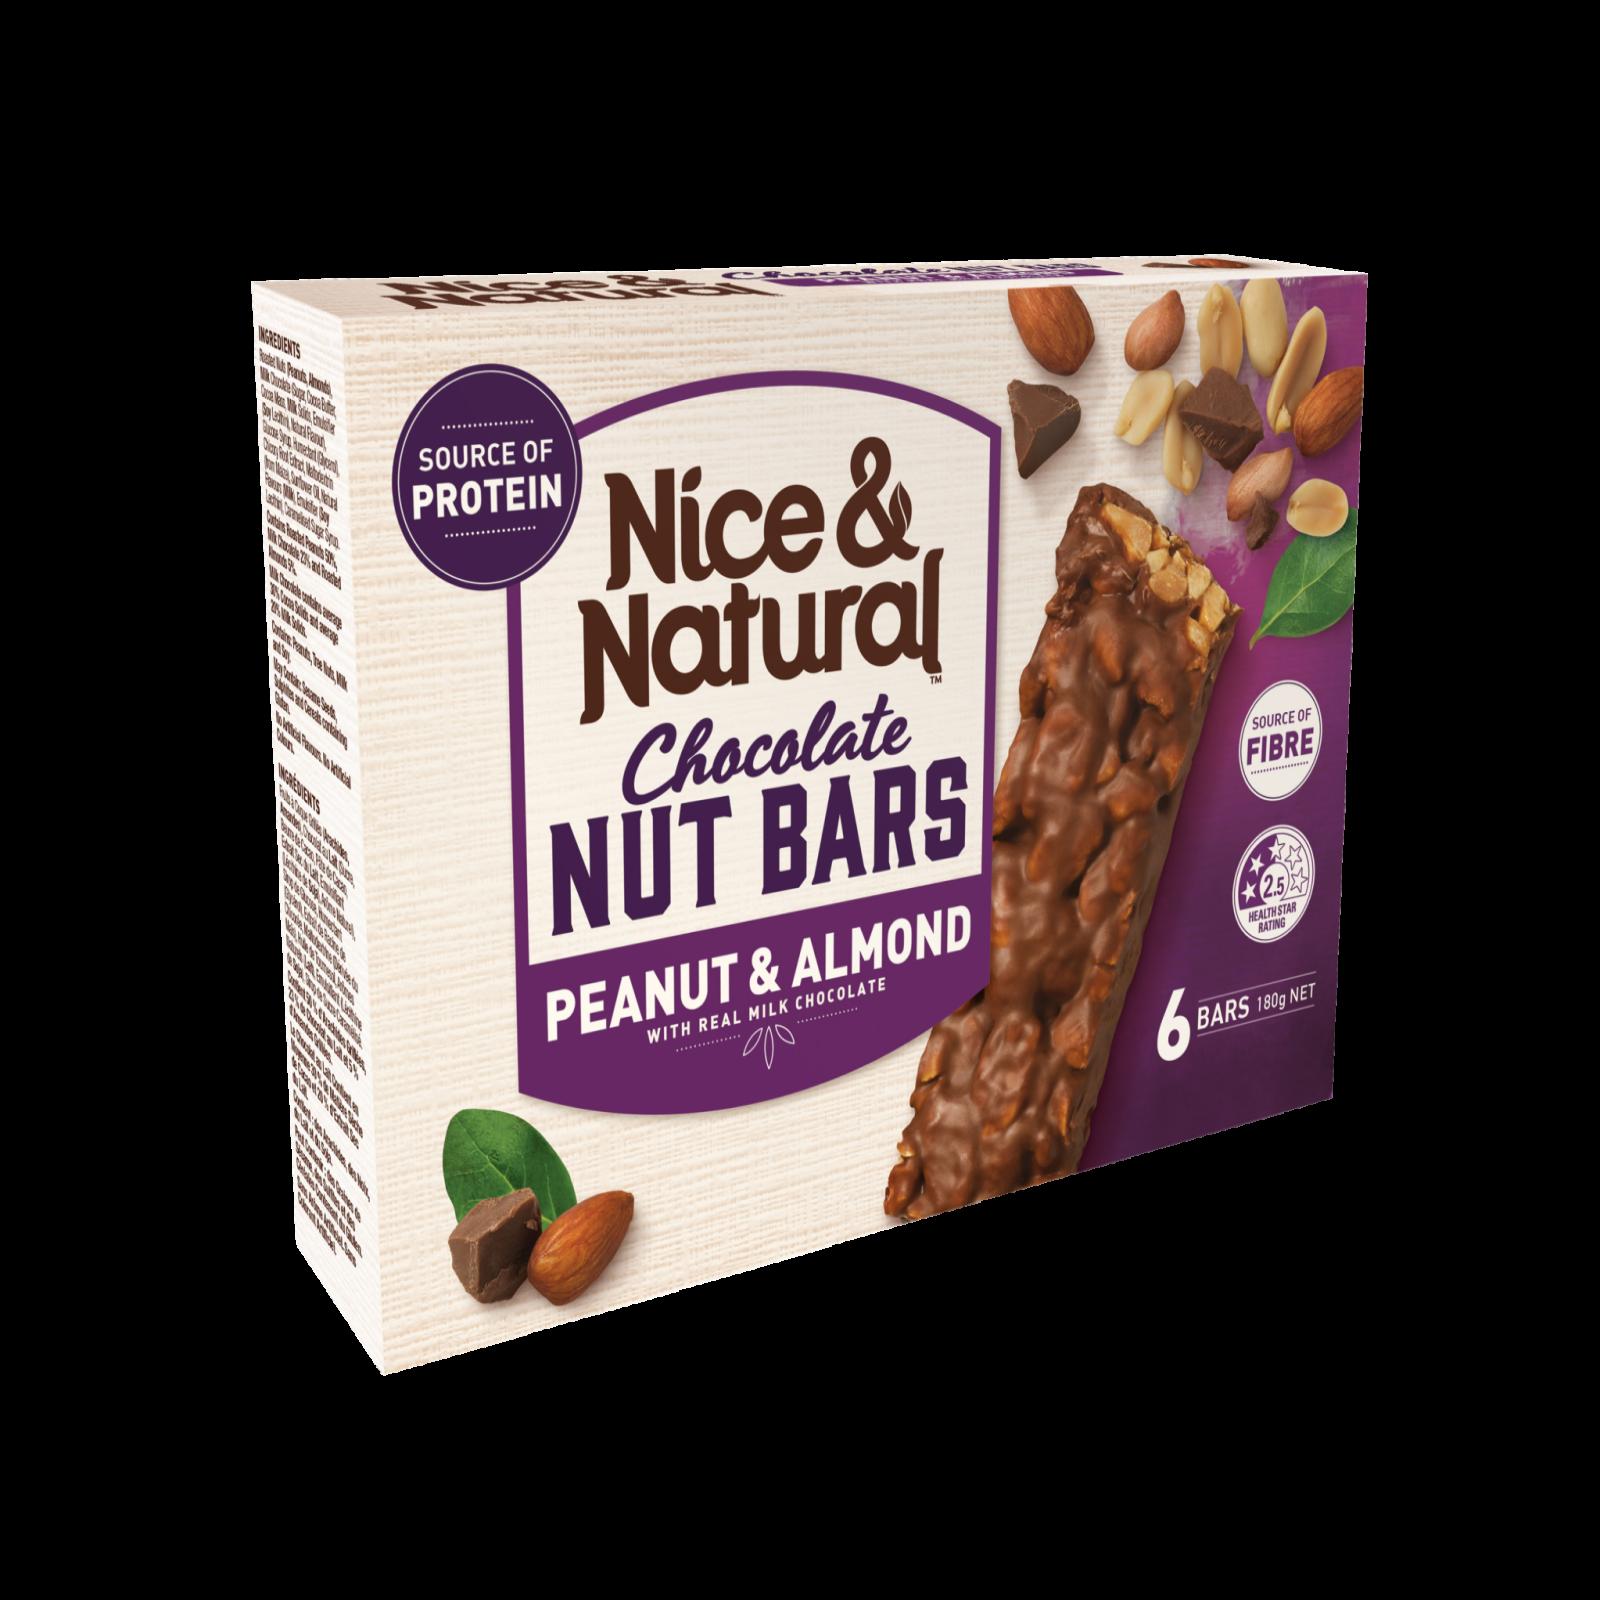 Peanut & Almond Chocolate Nut Bar product image